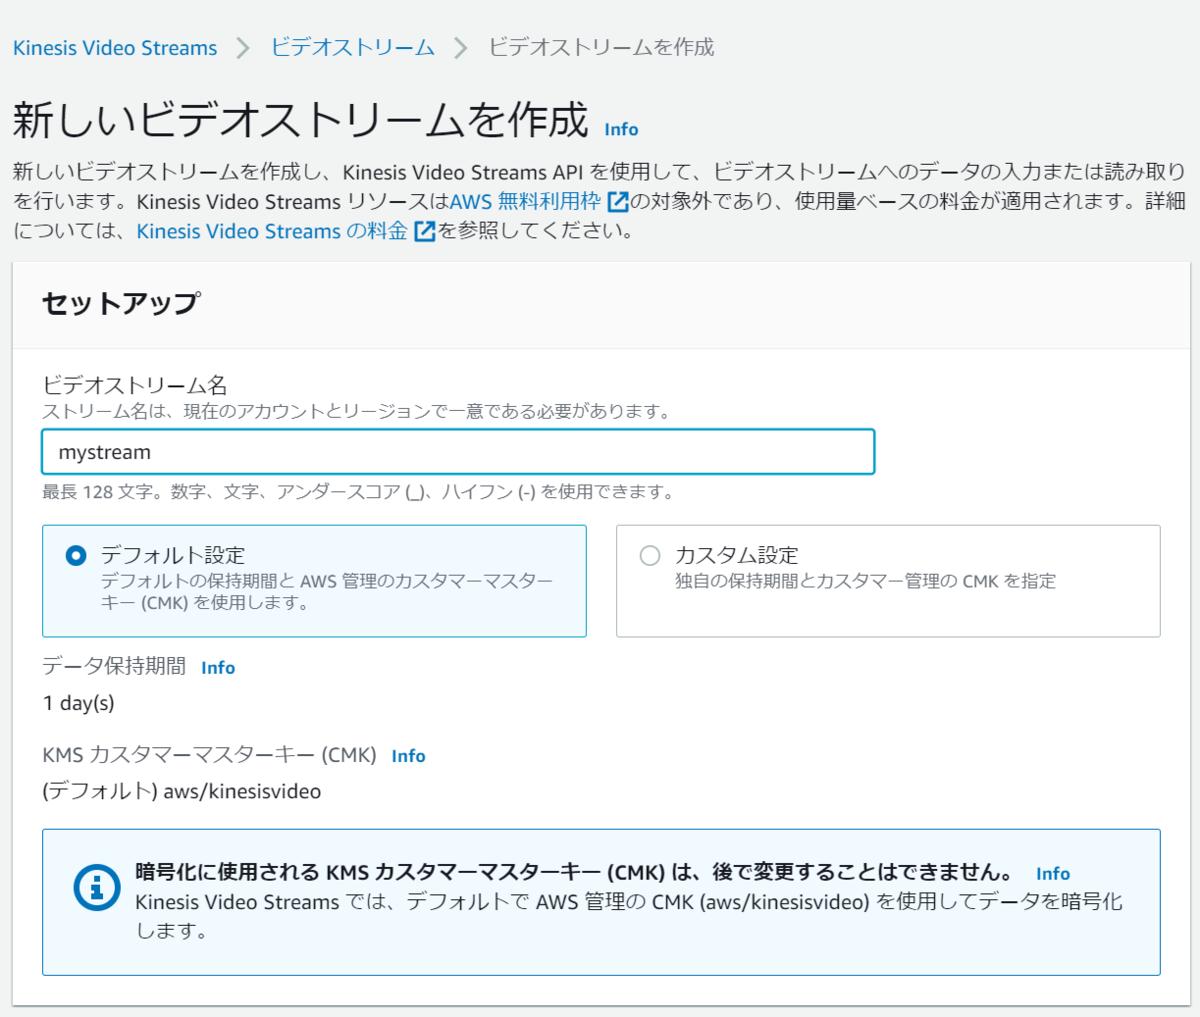 f:id:shuzo_kino:20200921143212p:plain